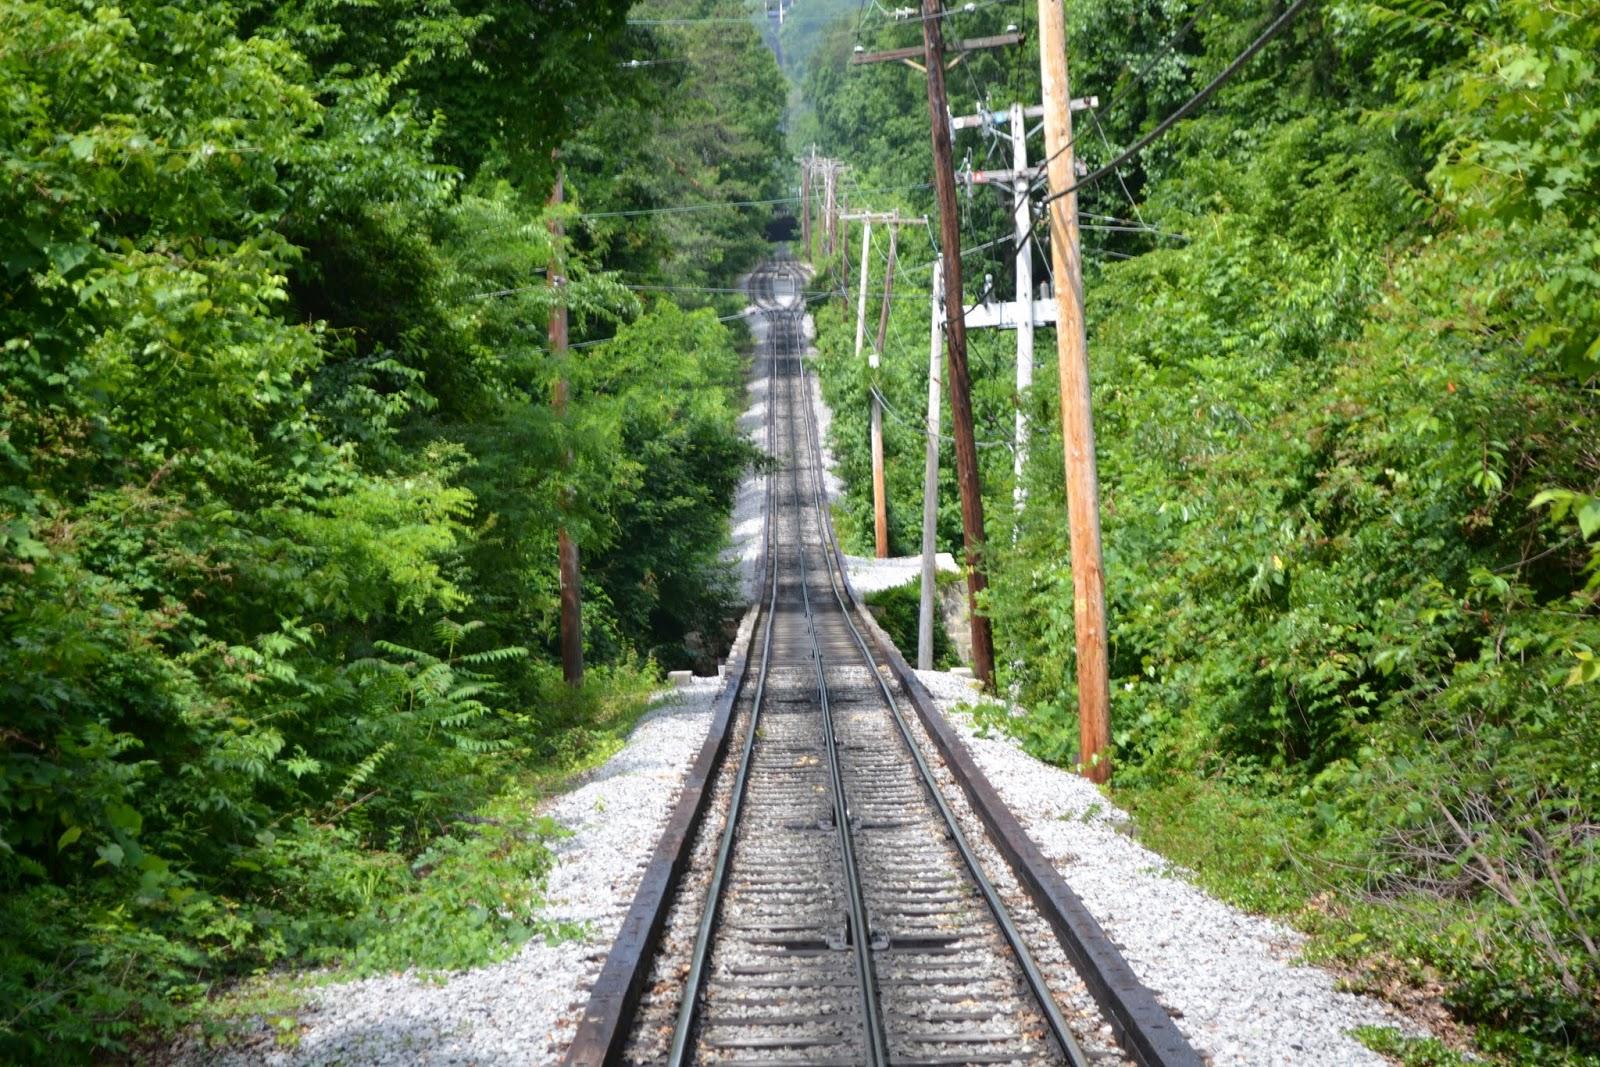 Фуникулер на горе Лукаут, Теннесси (Incline Railway, Lookout Mountain, Tennessee)